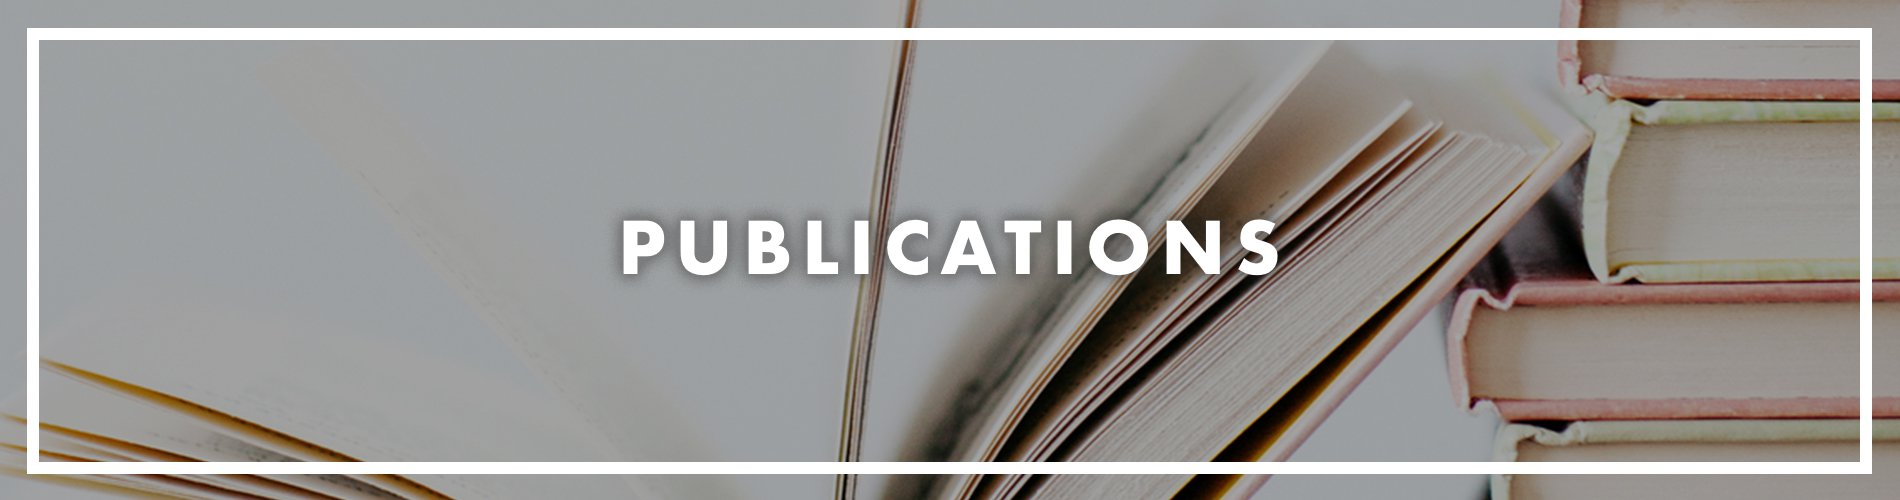 Publications banner